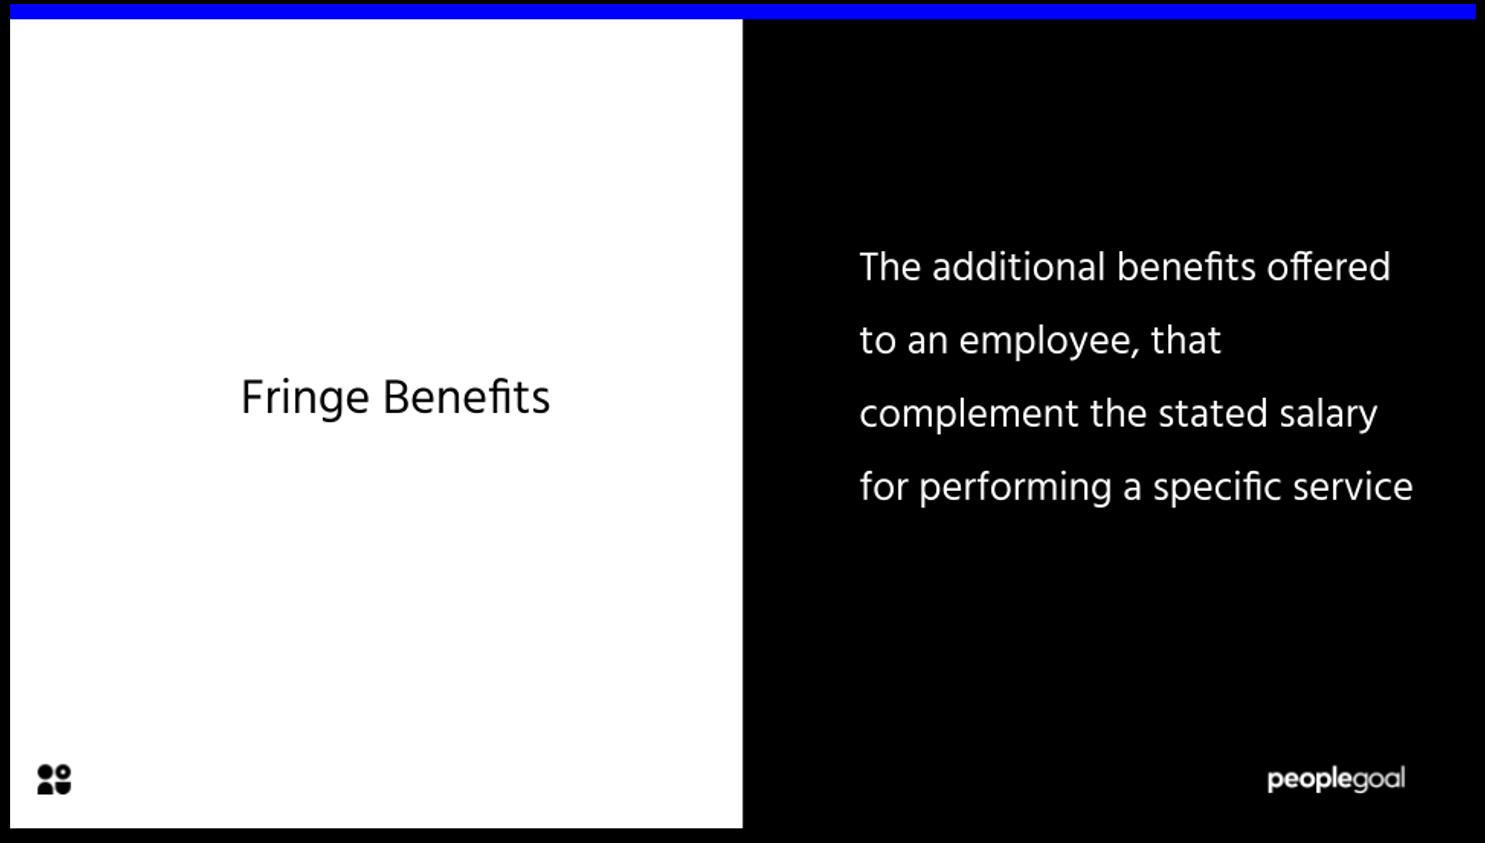 Fringe Benefits definition